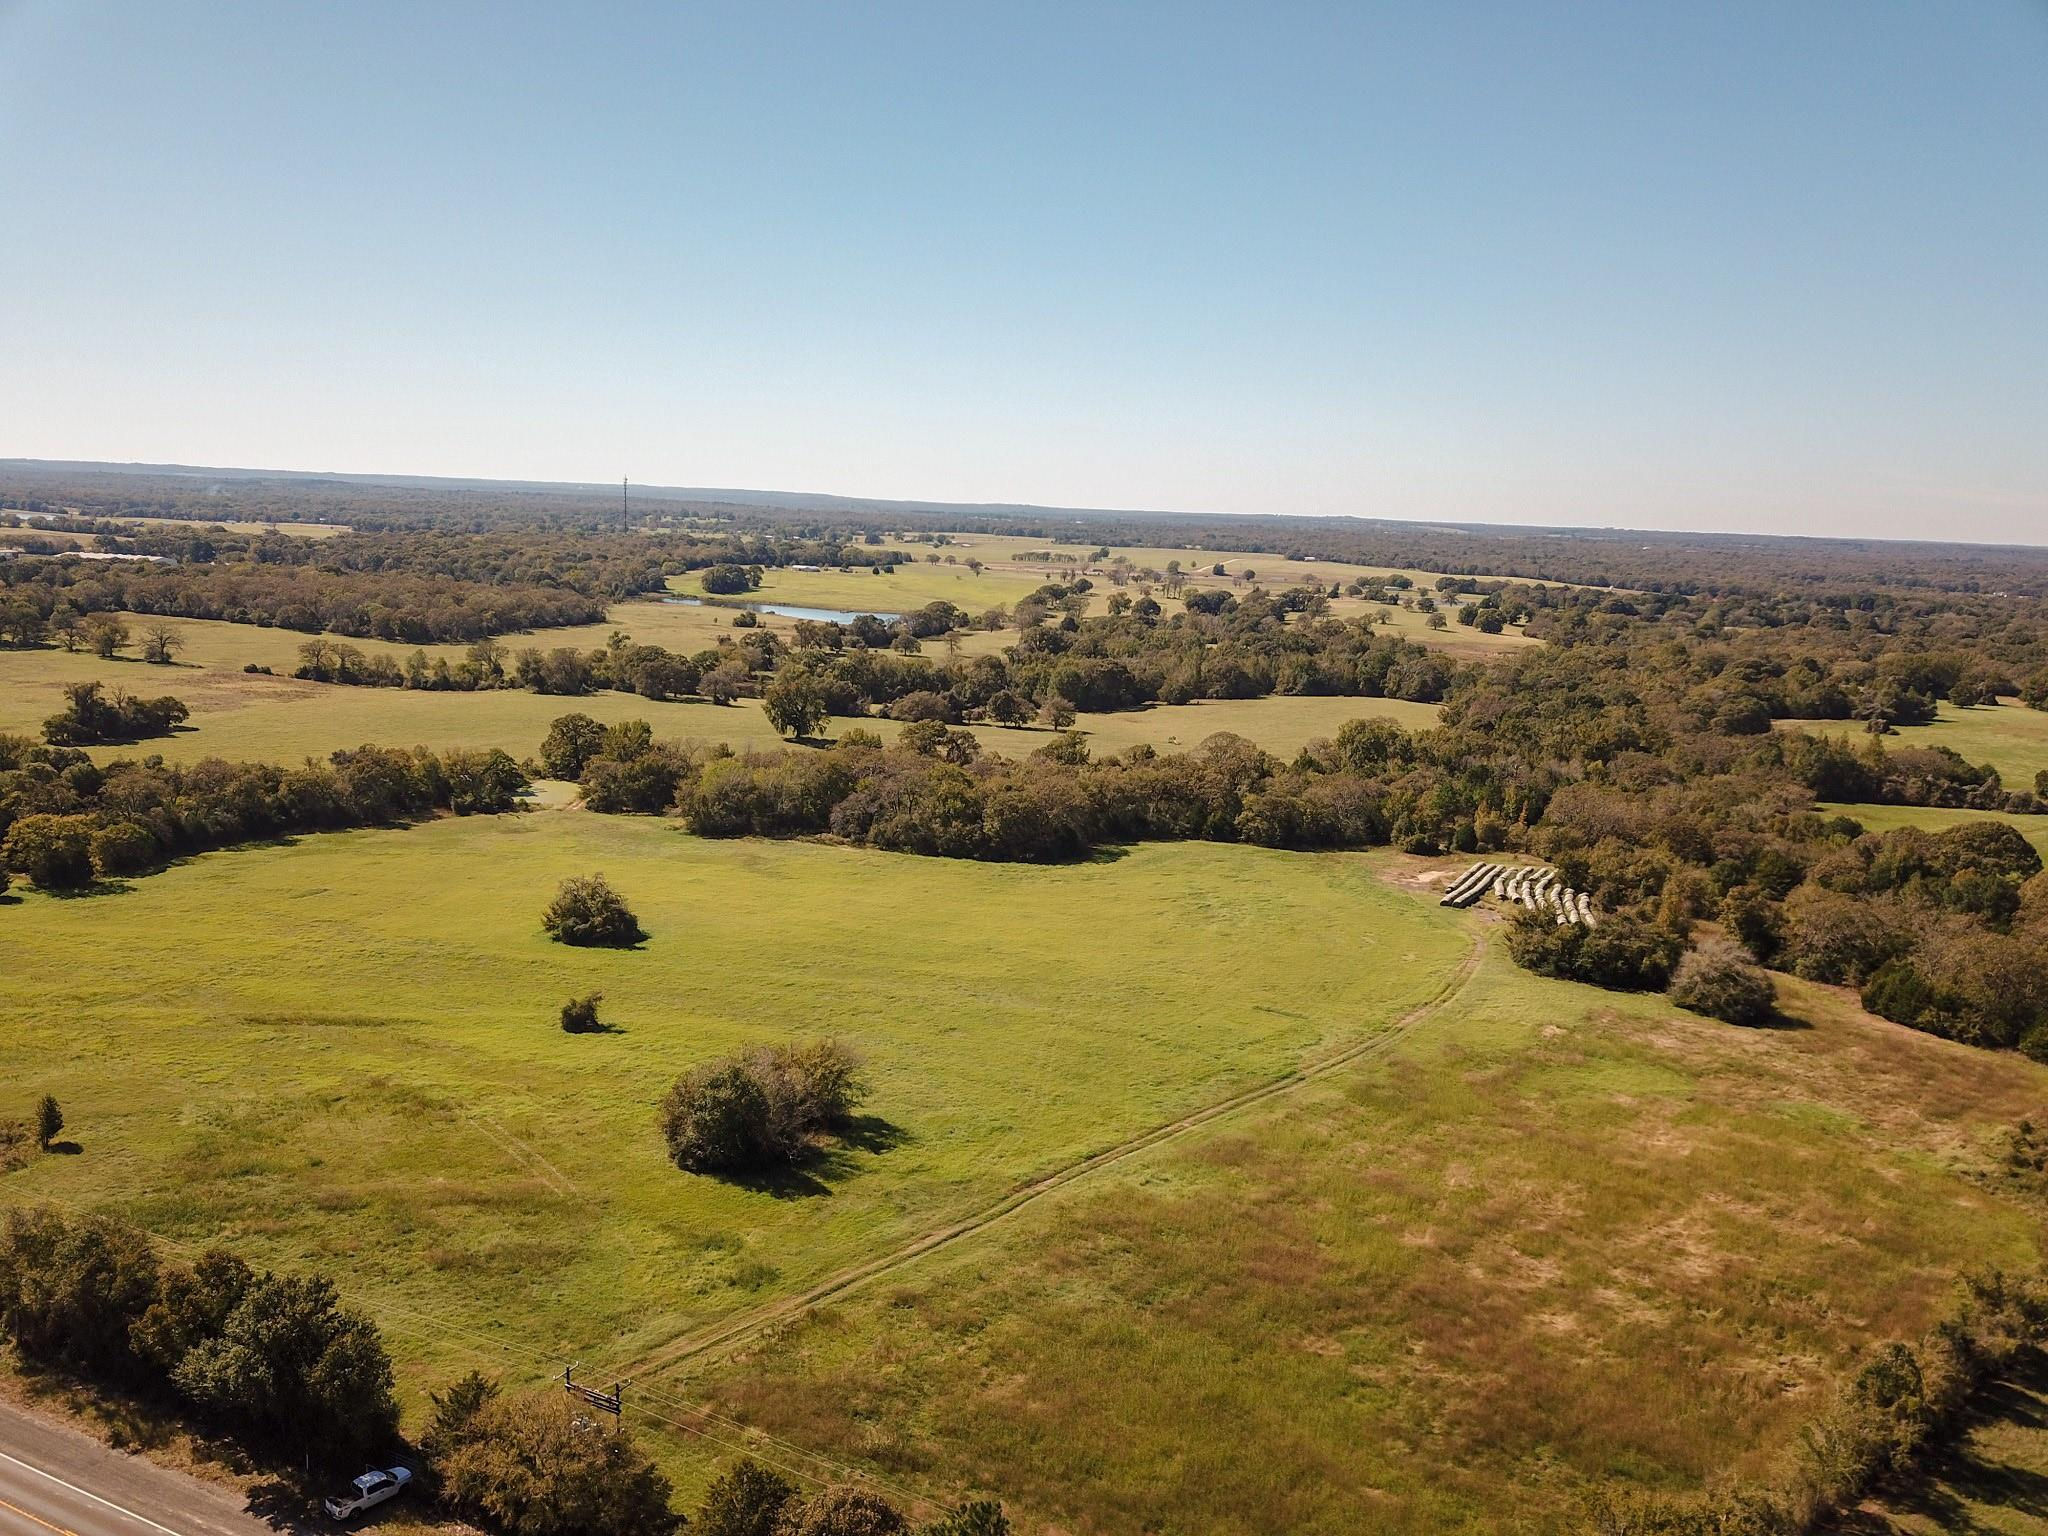 TBD Lot 4 HWY 75 S Property Photo - Buffalo, TX real estate listing